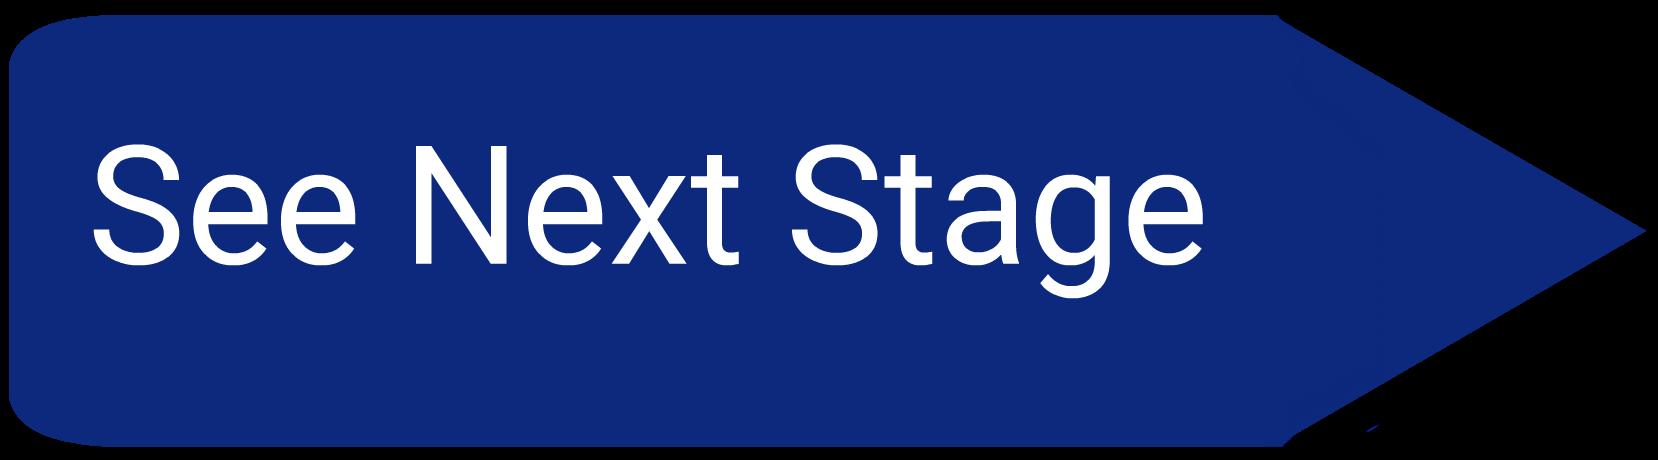 Next Step CTA-2